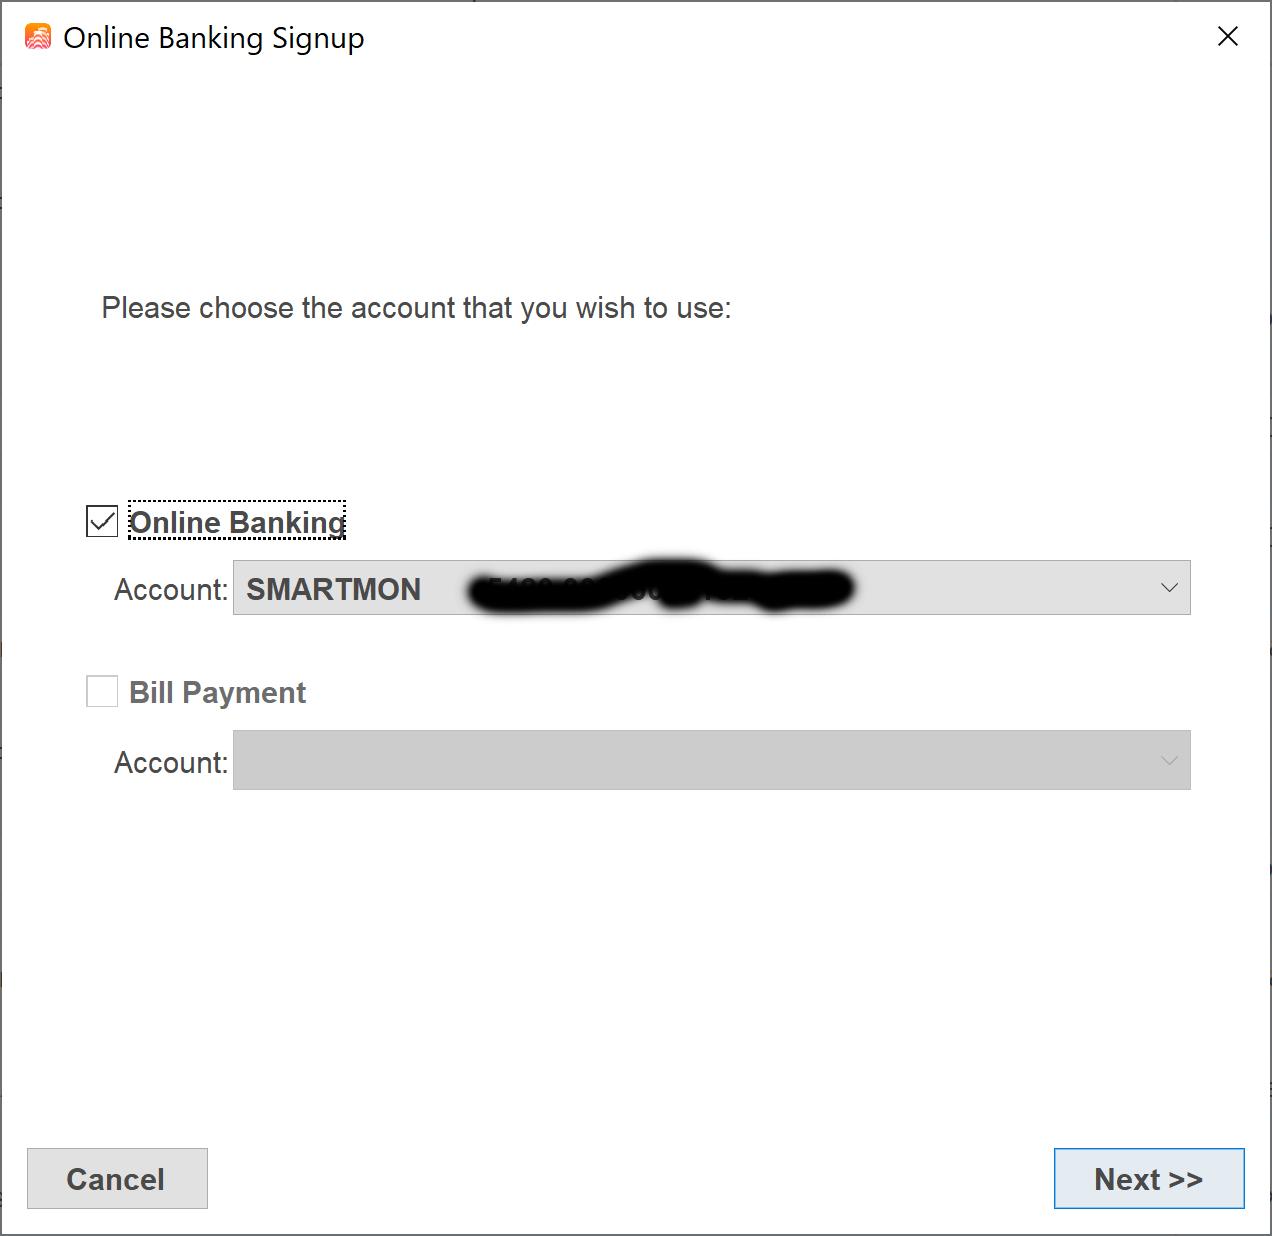 Online-banking-signup